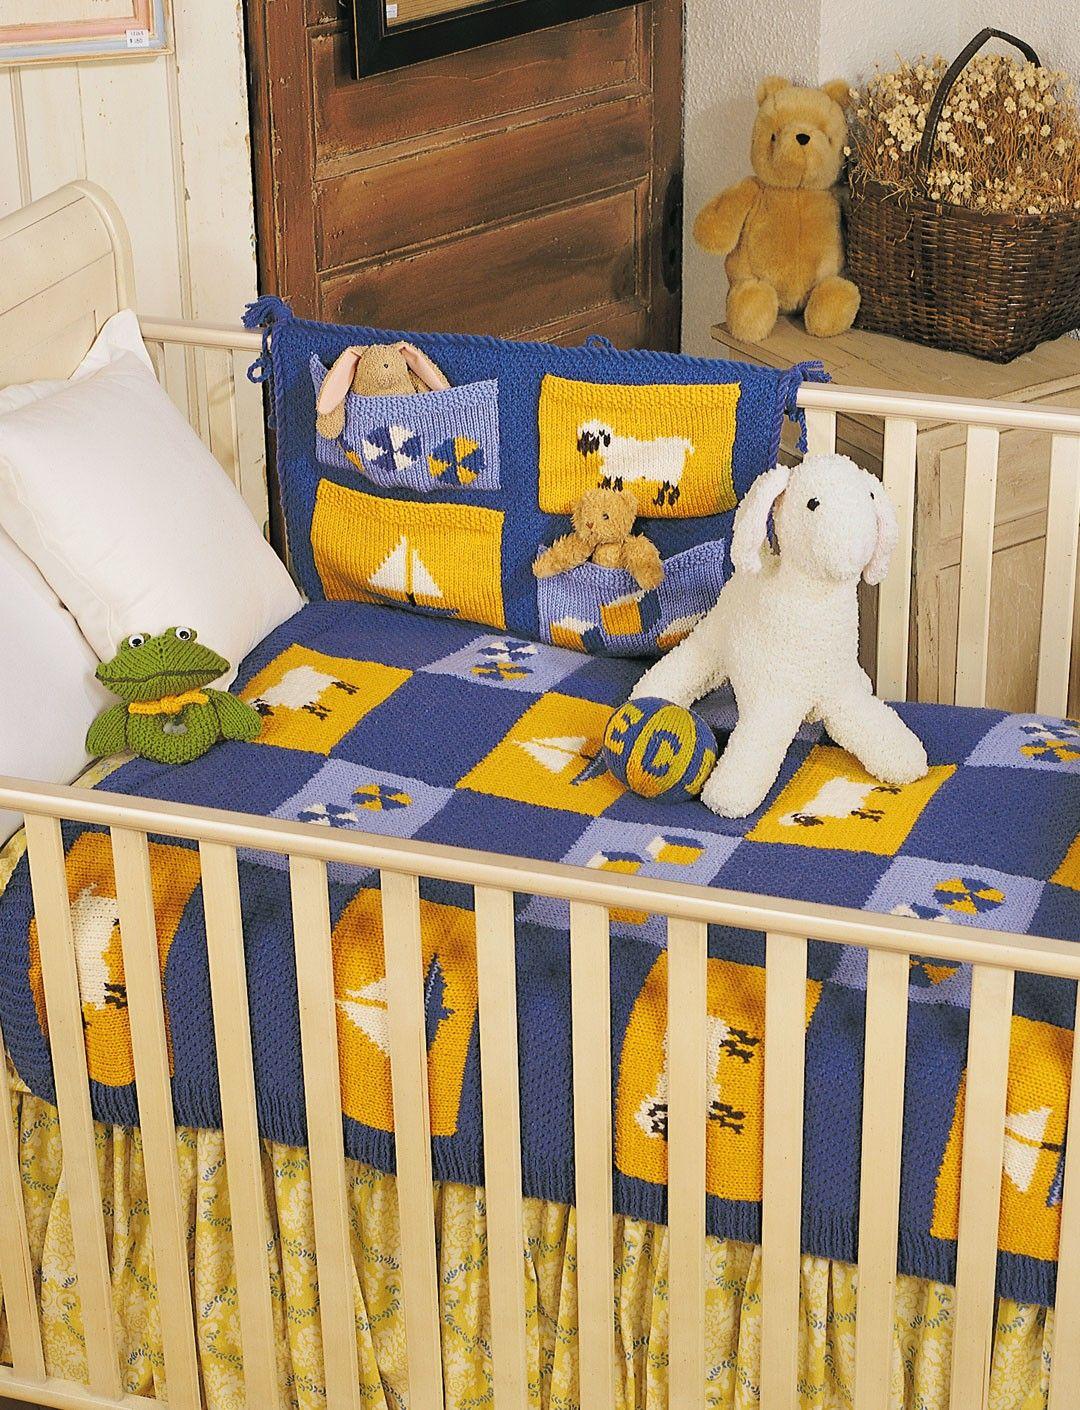 Yarnspirations Patons Nursery Set Patterns